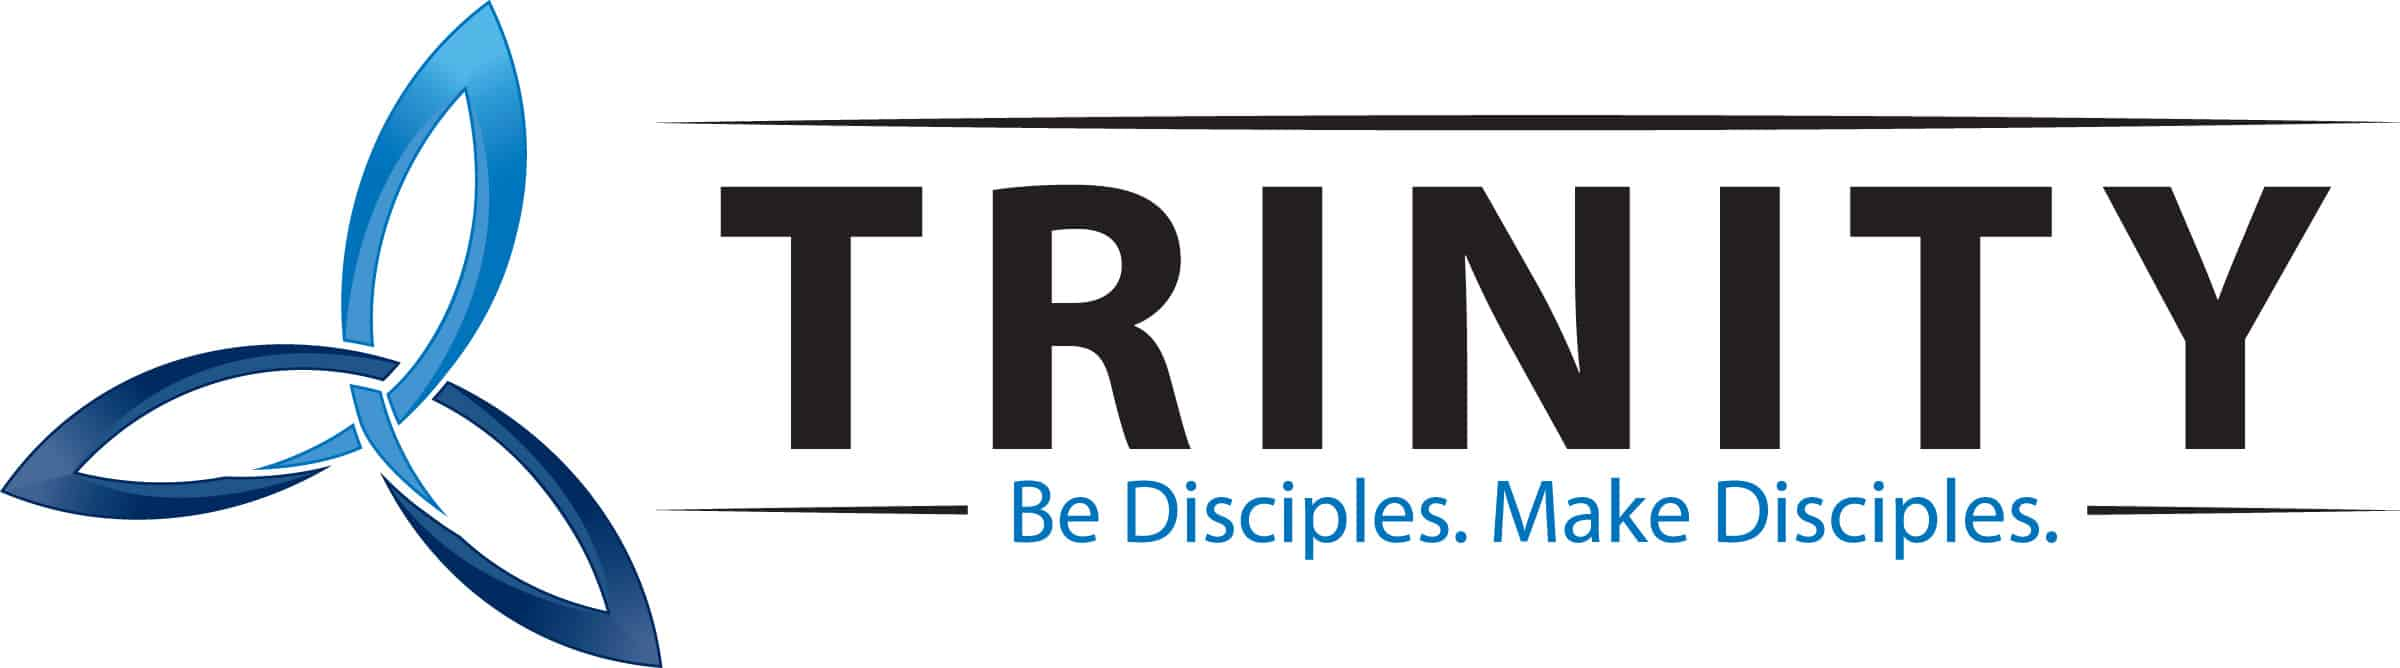 Lititz Trinity